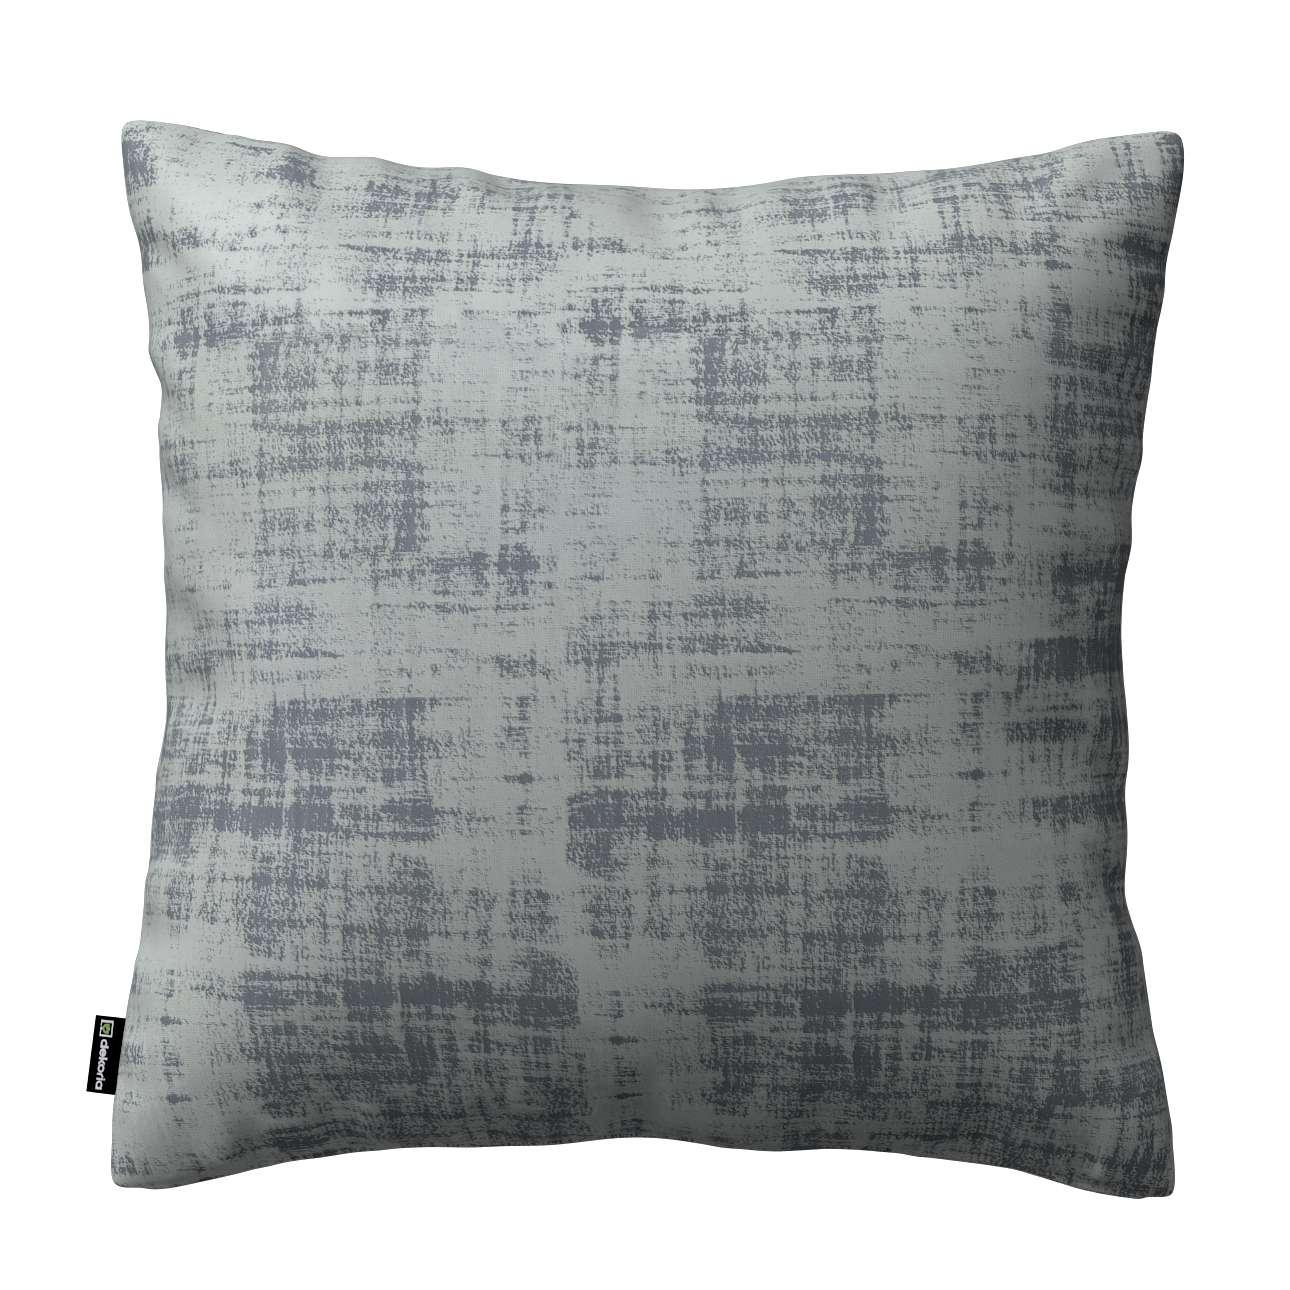 Karin - jednoduchá obliečka V kolekcii Velvet, tkanina: 704-32